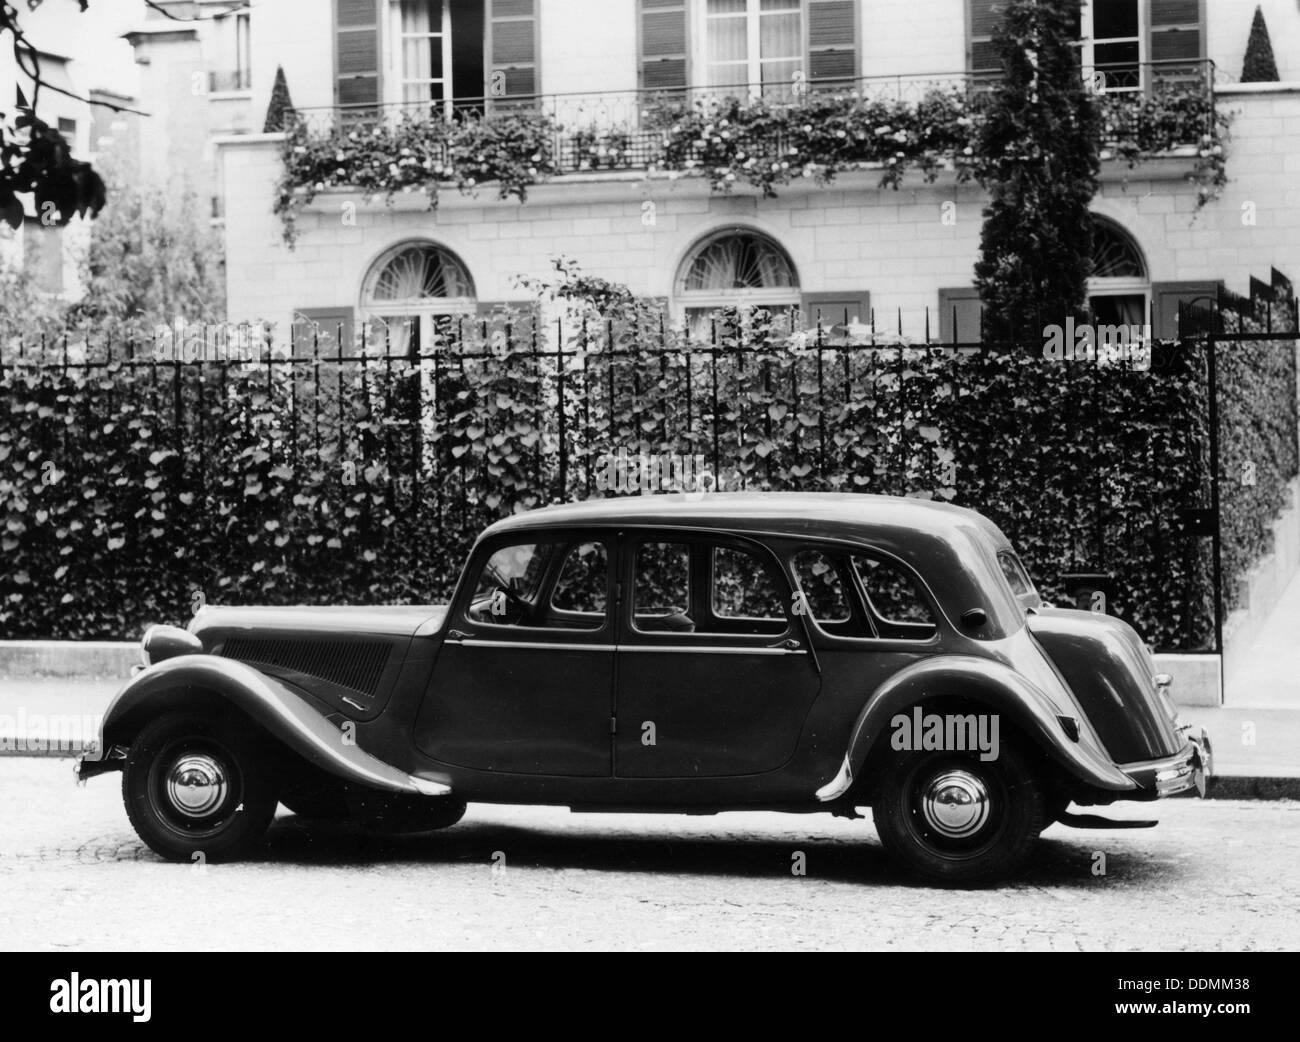 1954 Citroën 15CV Familiale parked outside a house. - Stock Image